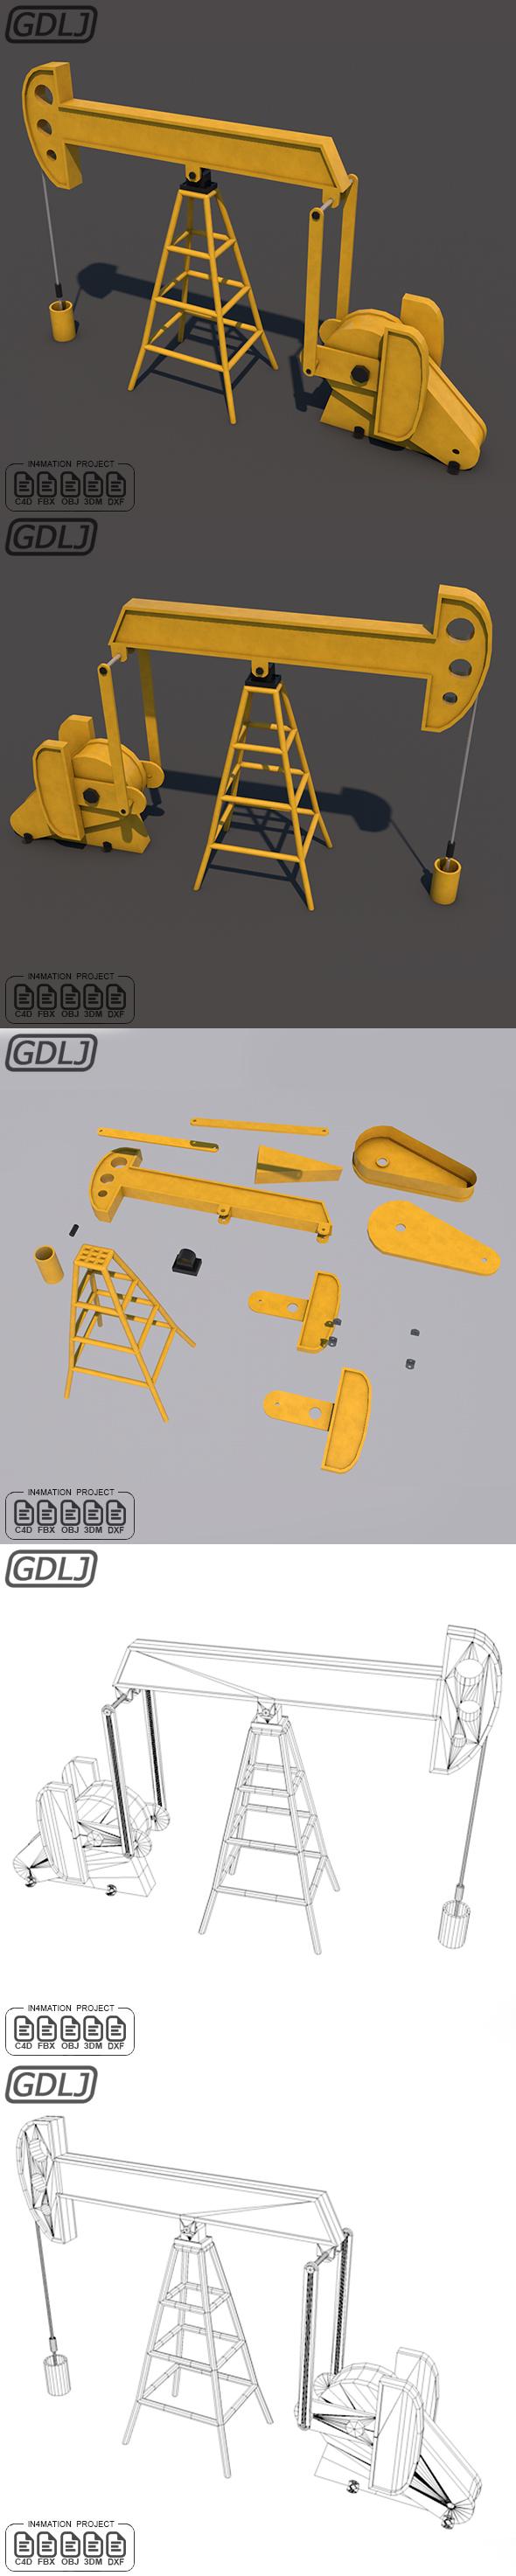 Oil Pumpjack 3D Model - 3DOcean Item for Sale